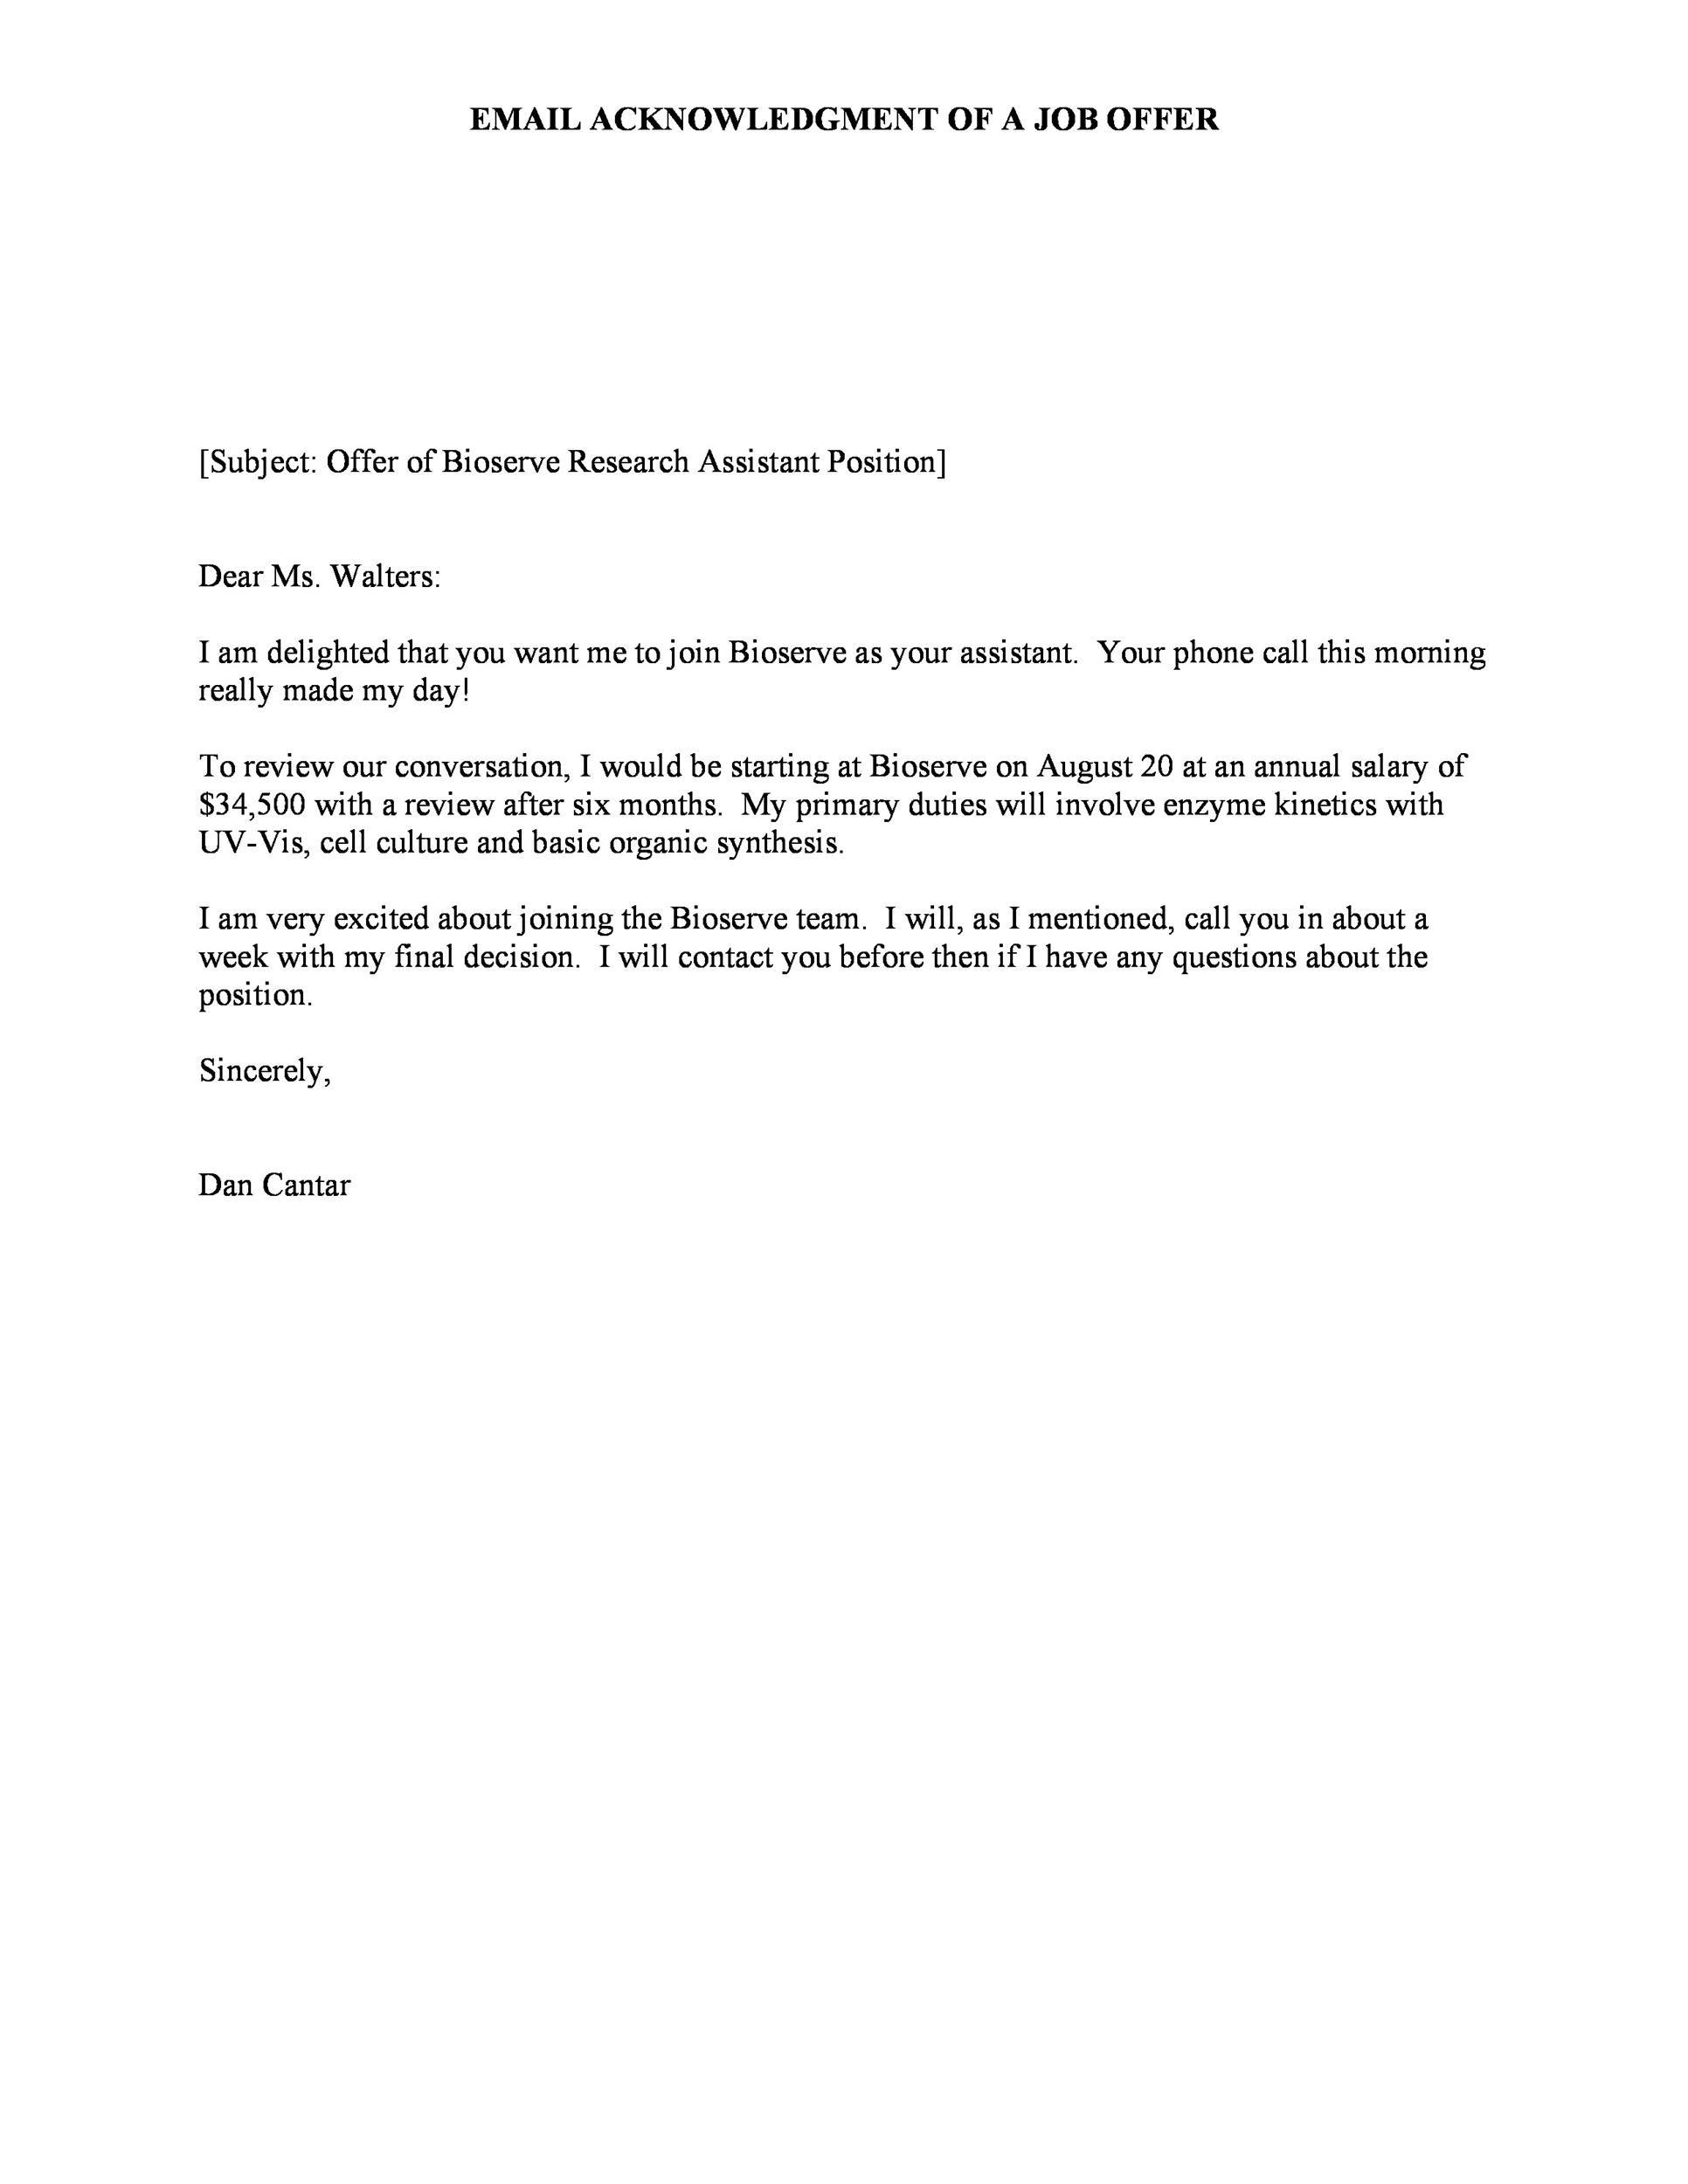 Free job acceptance letter 25